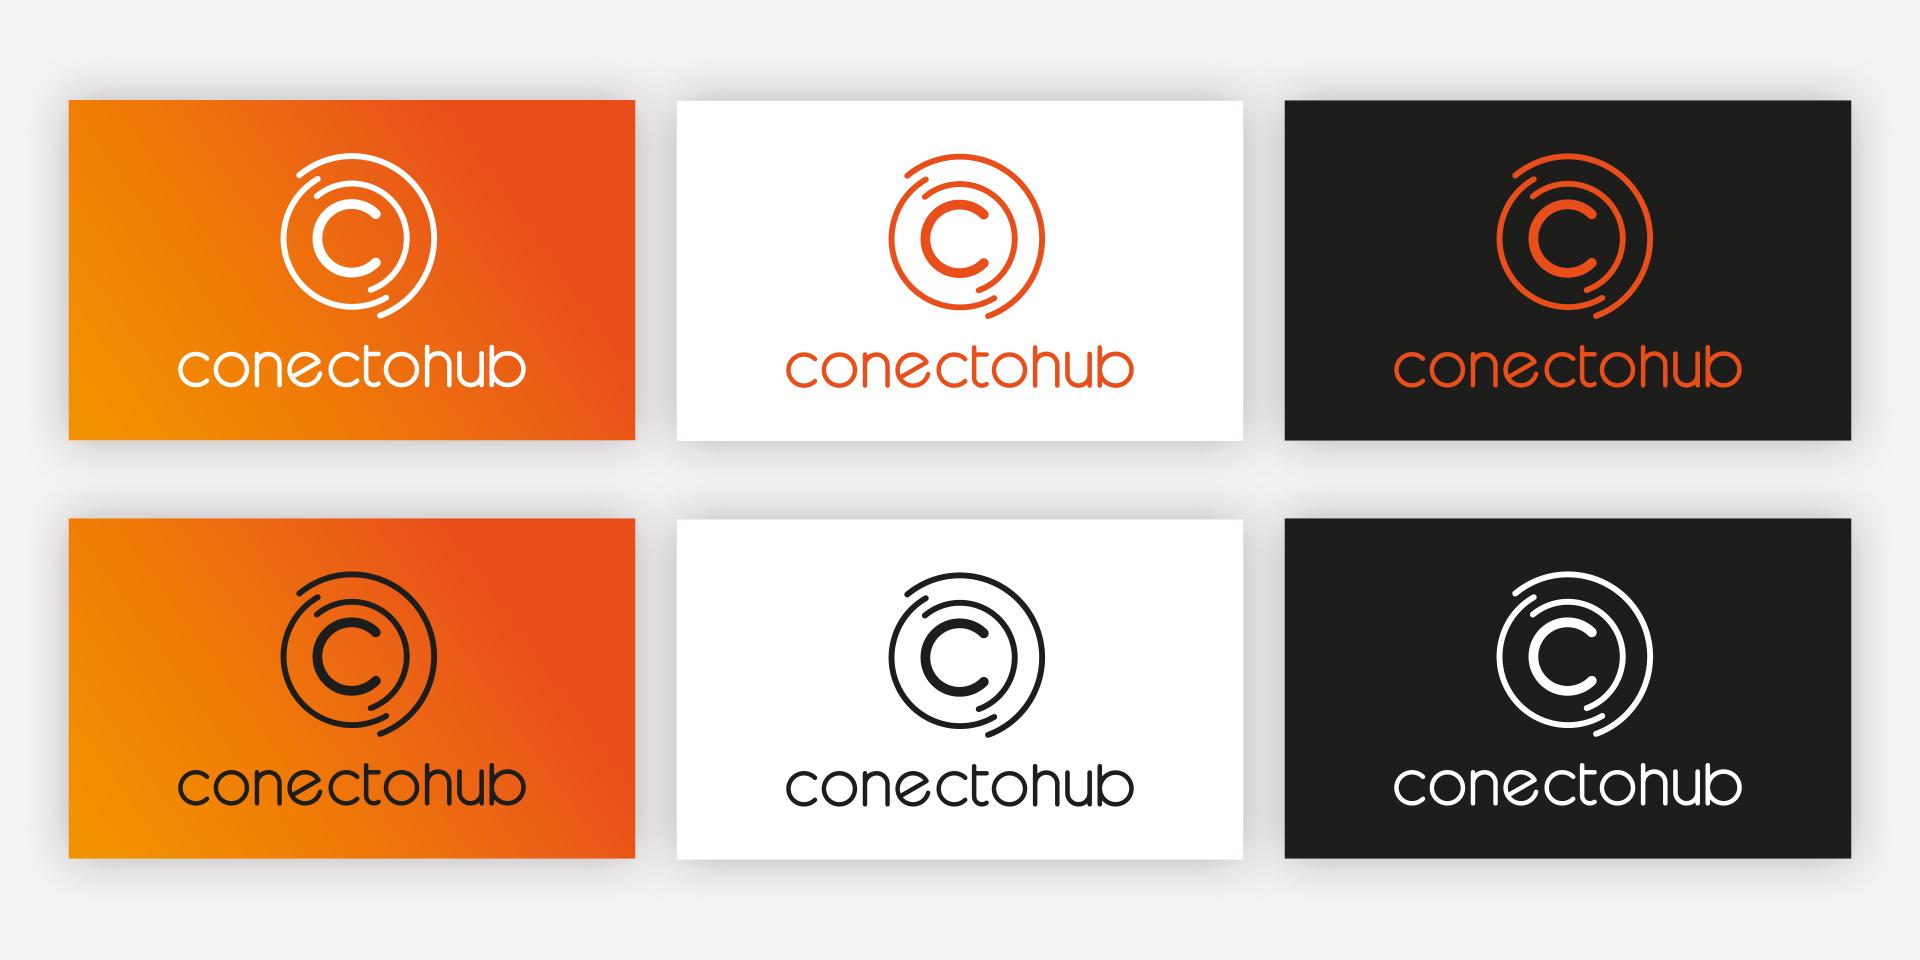 conectohub_logo_vertical_1920x960